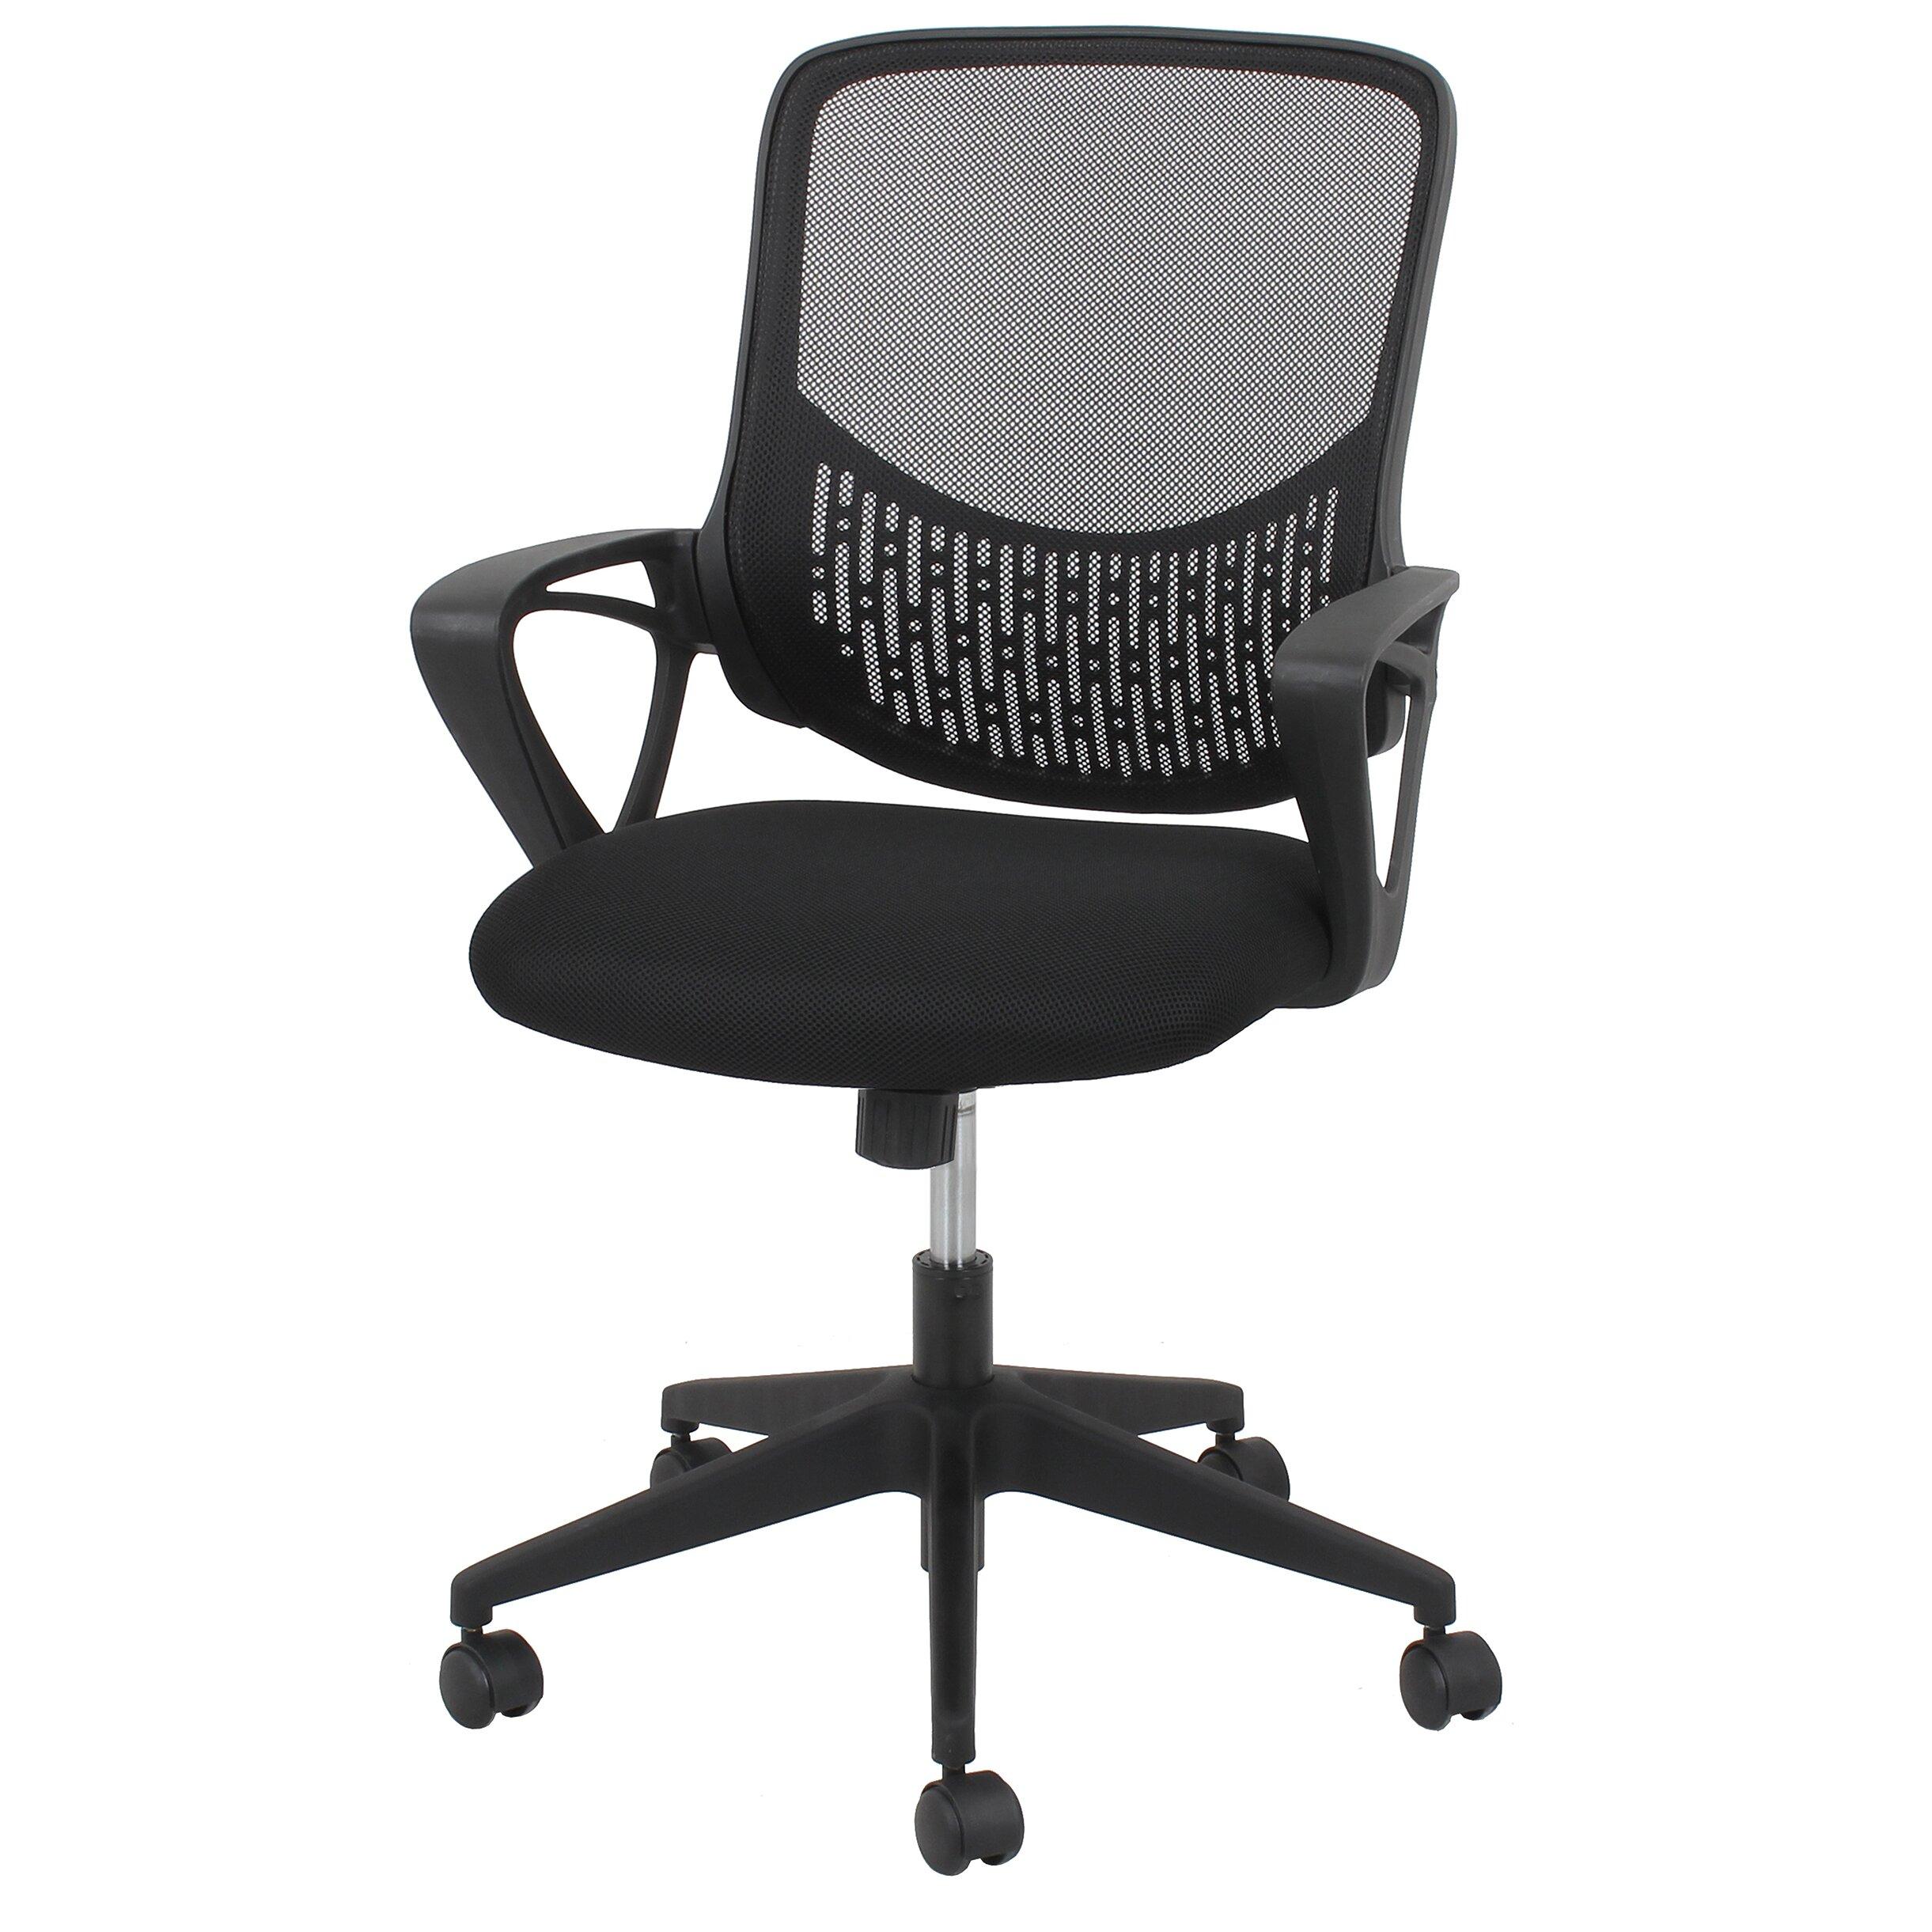 OFM Essentials Mid Back Mesh Desk Chair